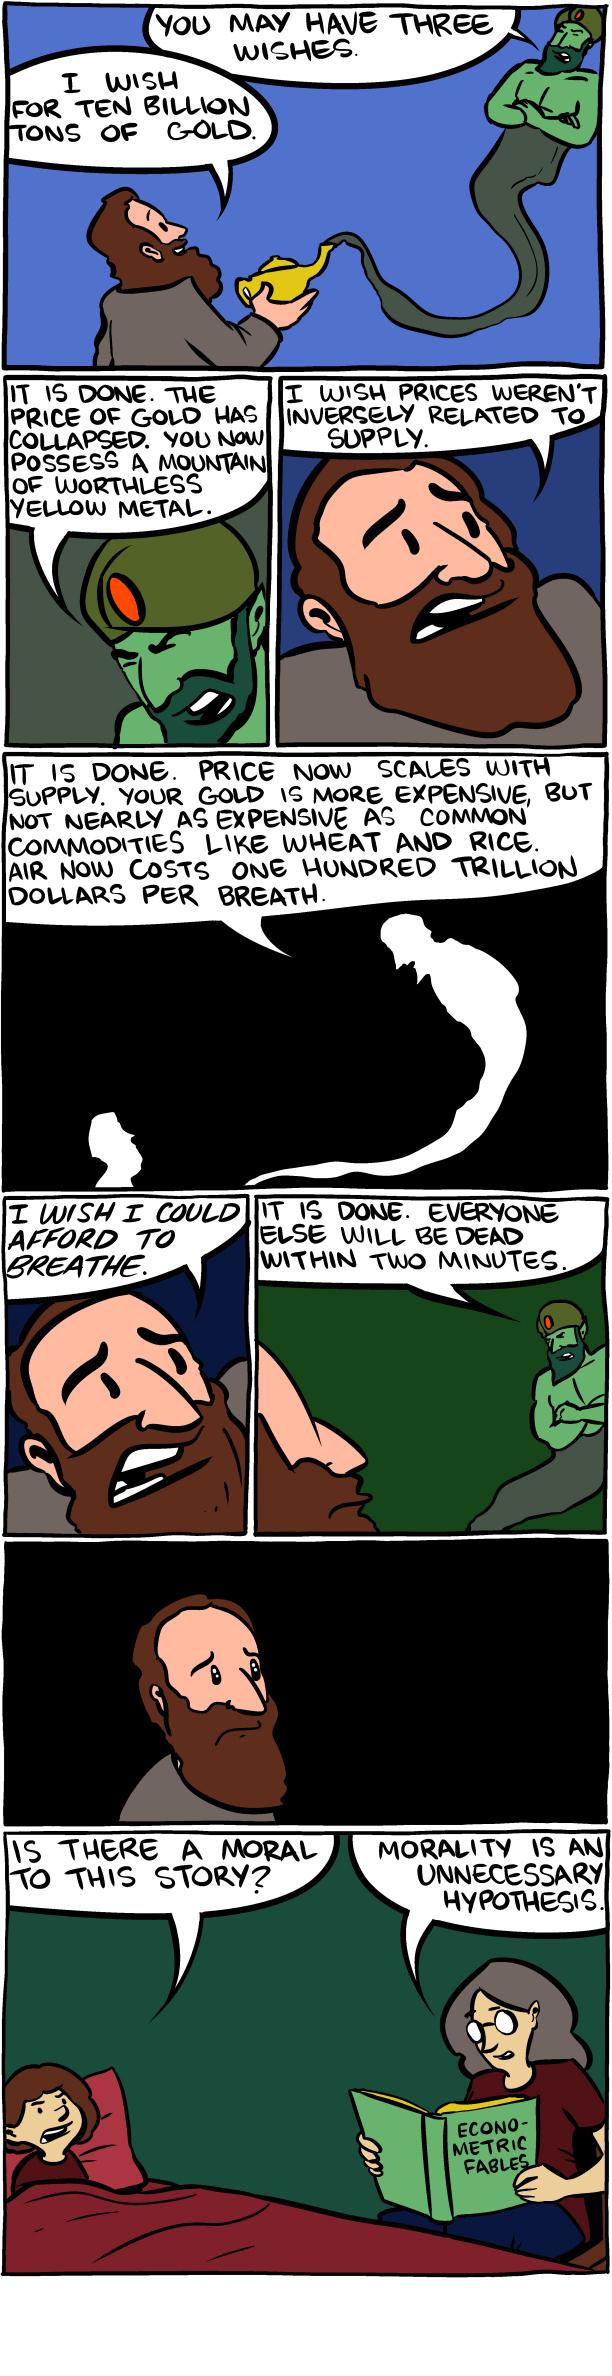 2 Hilarious Comic Fables For The Killjoy Economists In Your Life Smbc Comics Funny Economics Humor